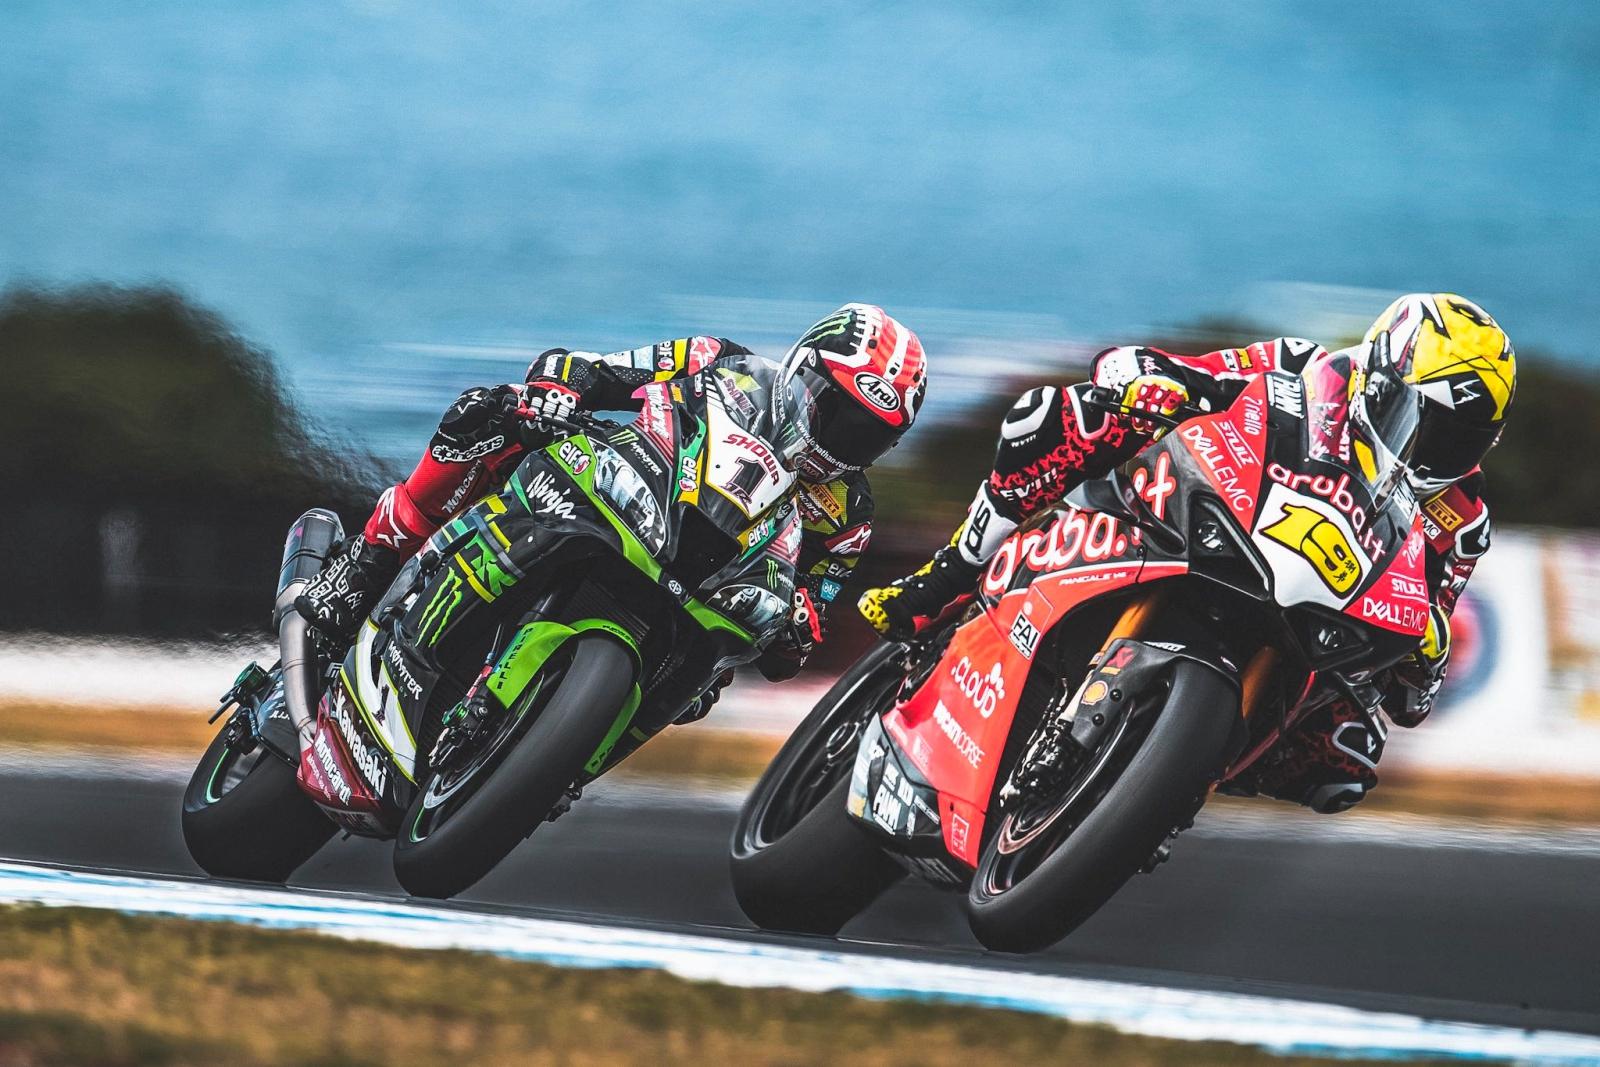 Superbike 2019: pilotos, motos, calendario, 2 españoles y cinco favoritos